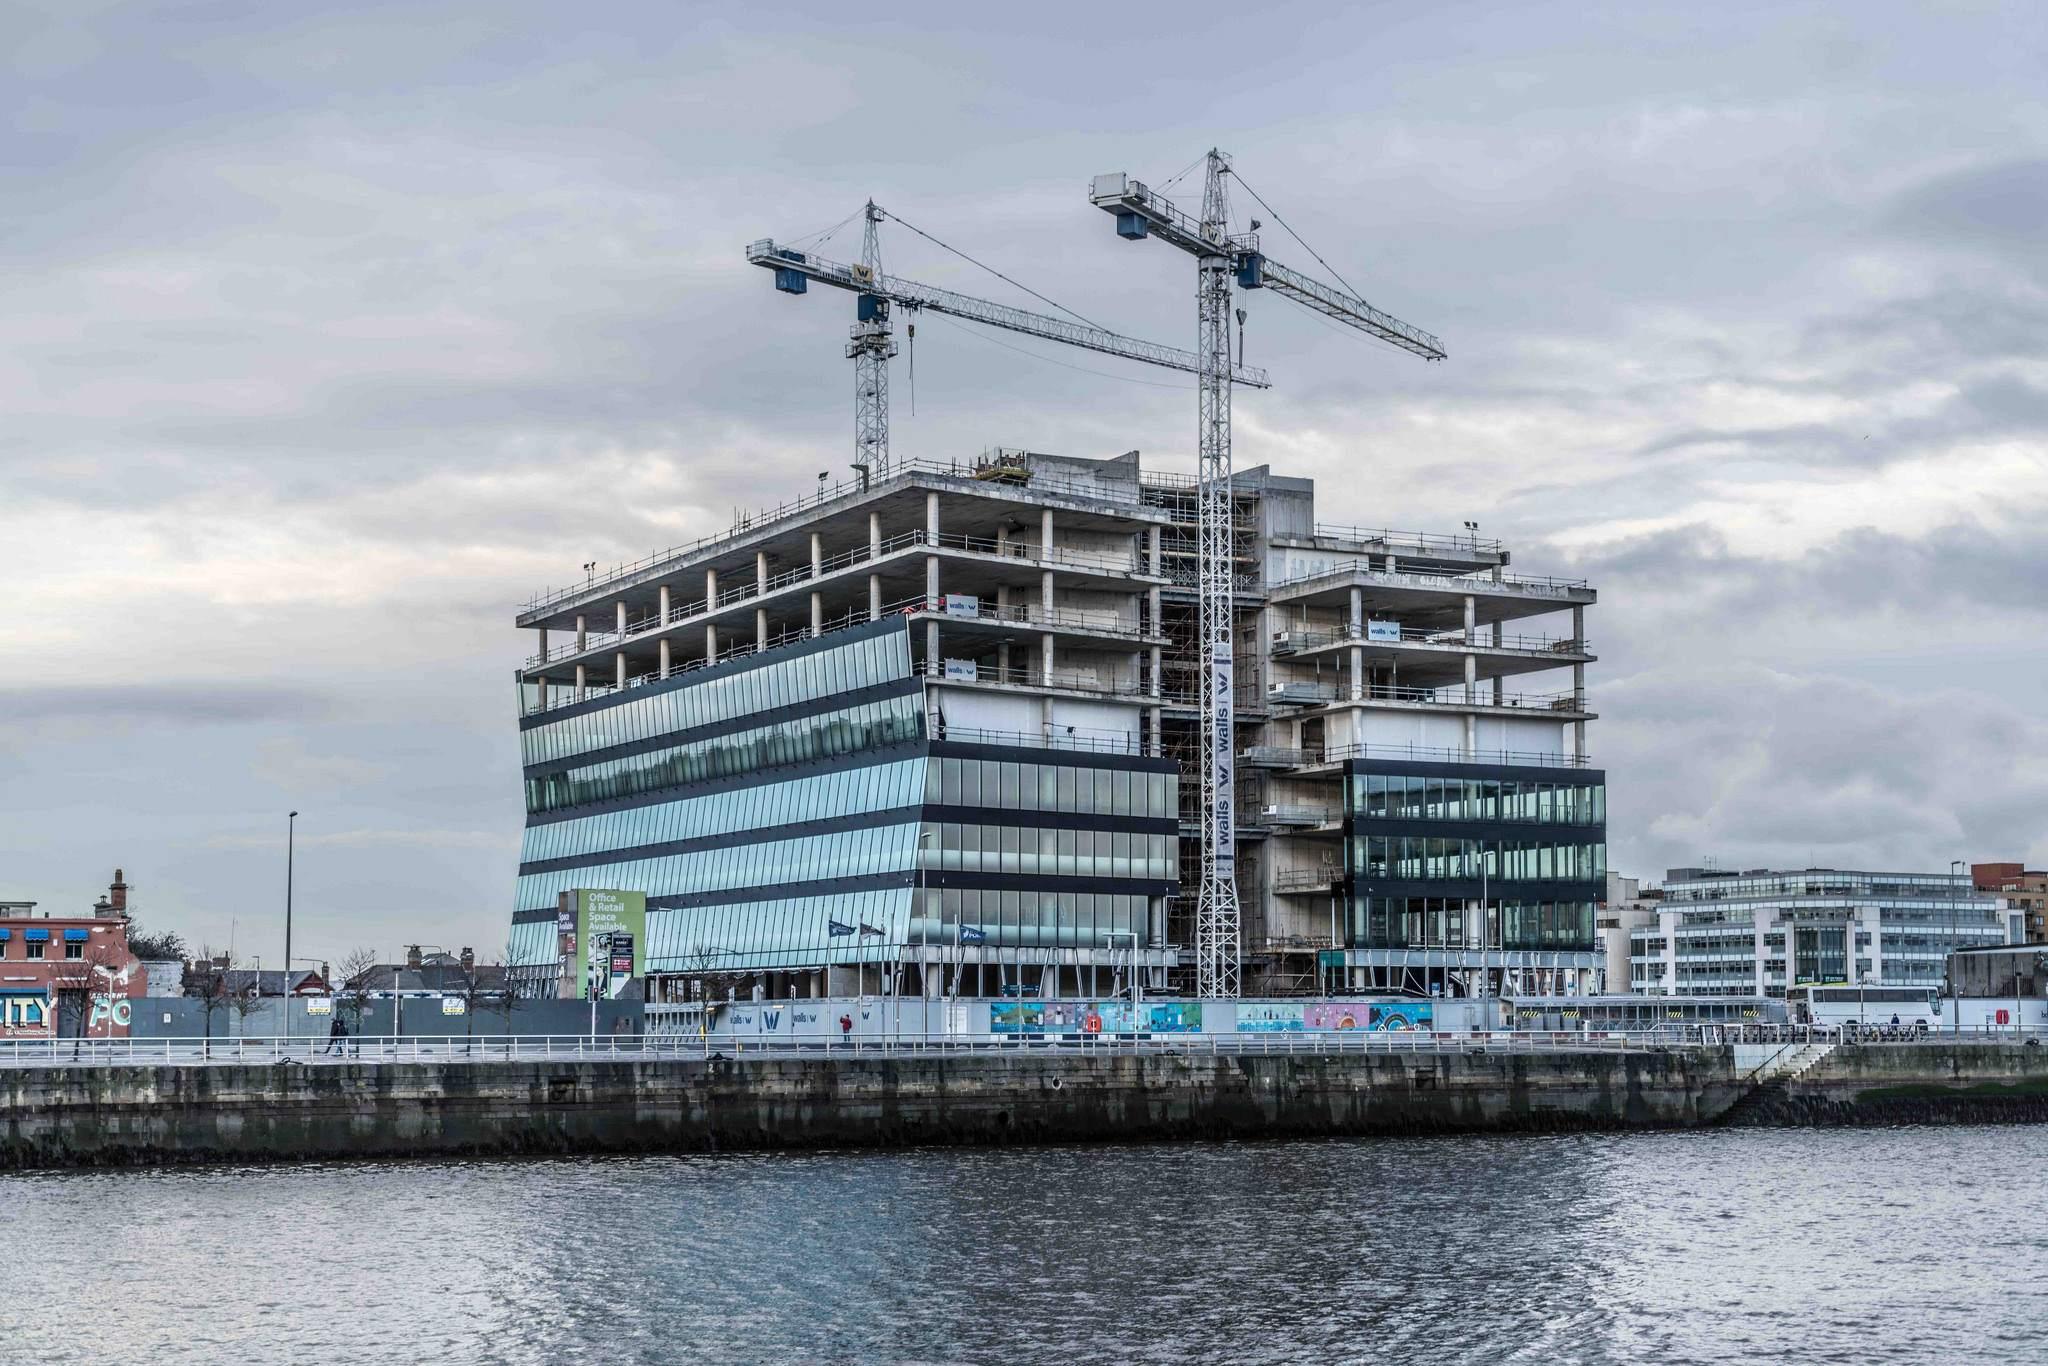 dublin docklands10 Walking Around Dublin Docklands by Marphy